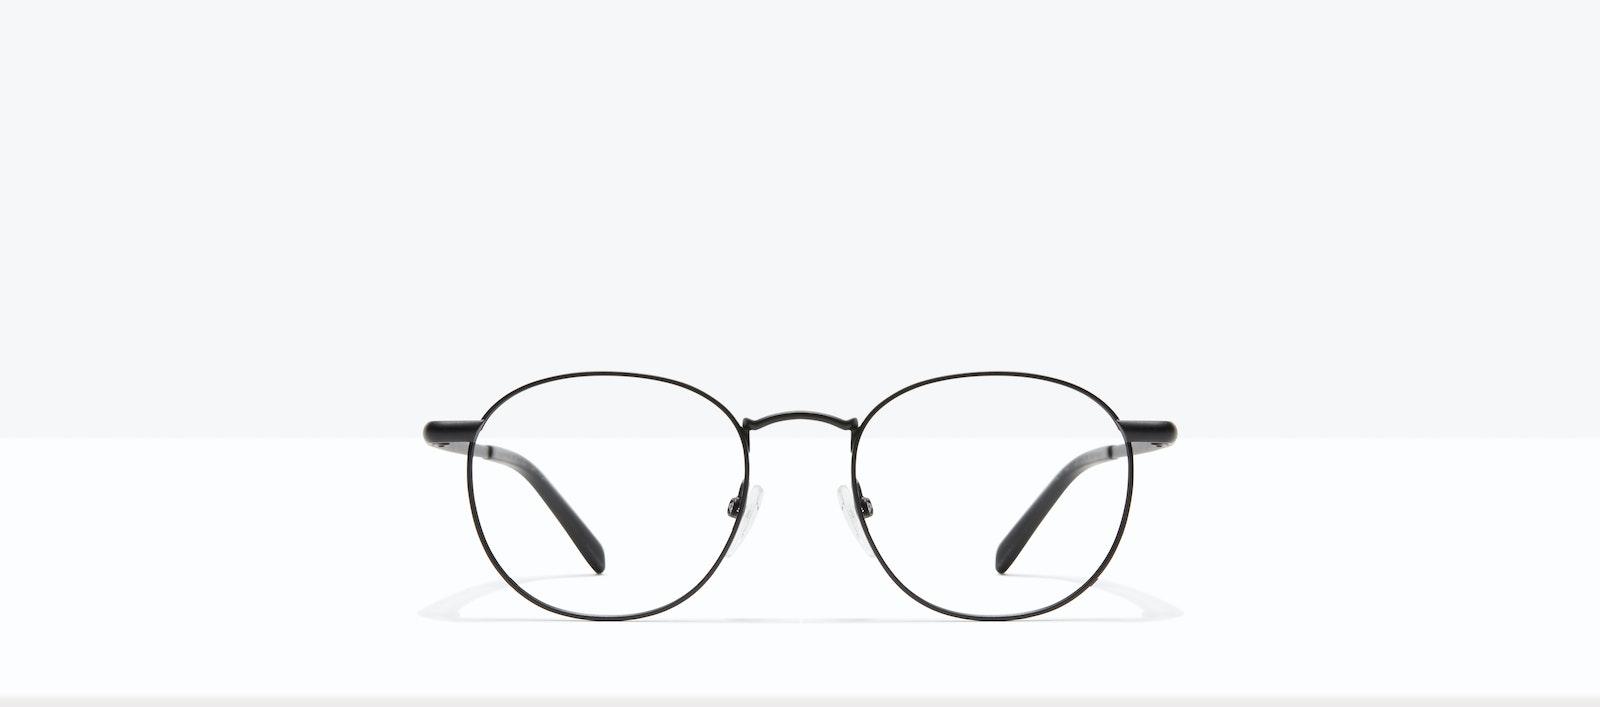 Affordable Fashion Glasses Round Eyeglasses Men Women Divine Matte Black Front